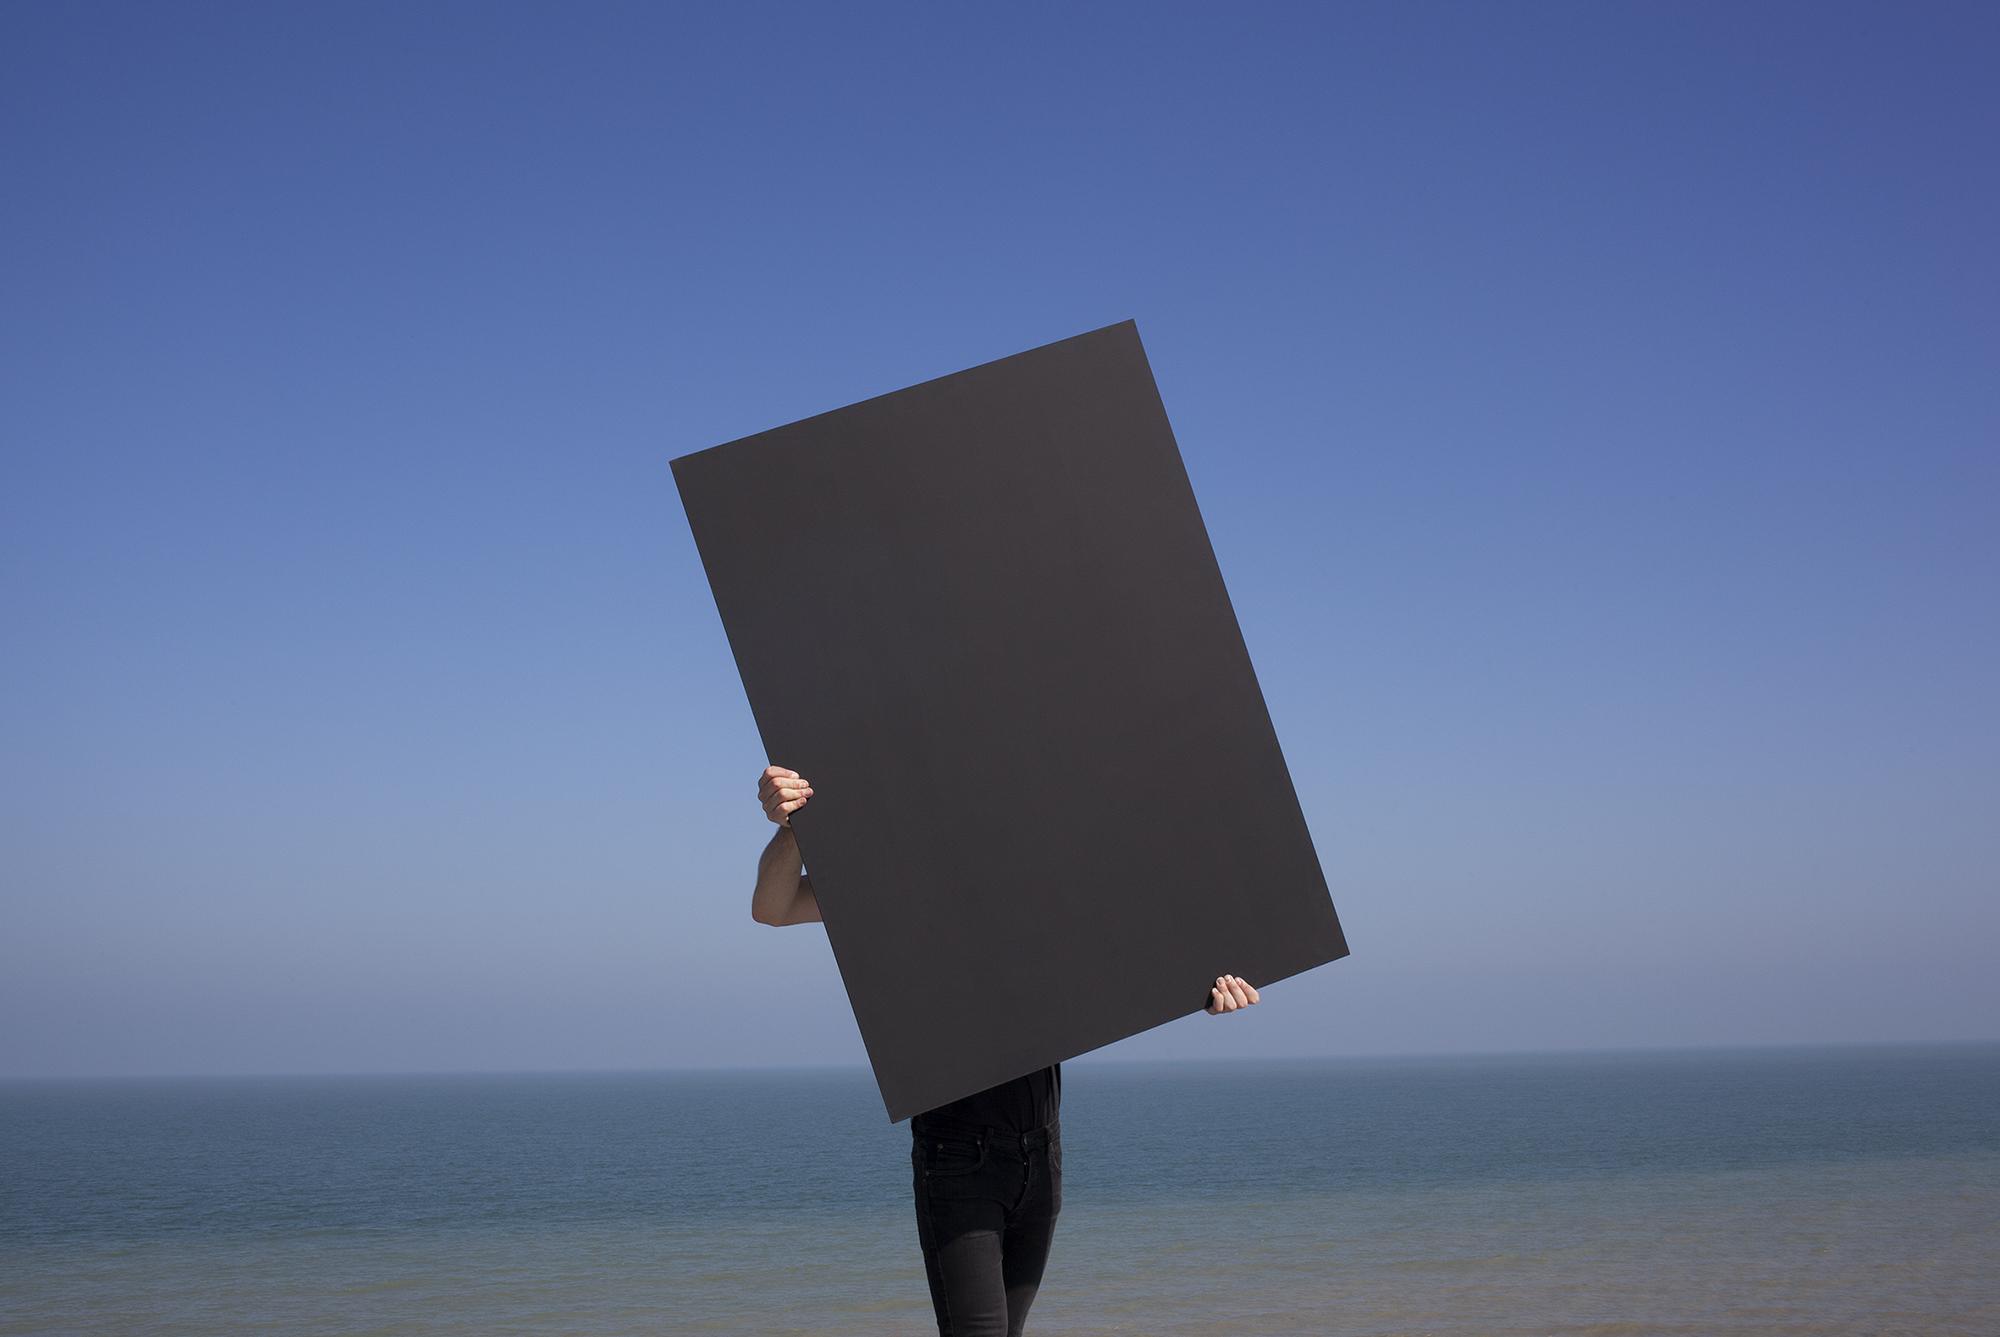 Tom-Lovelace-Coastal-Blocks-One.jpg